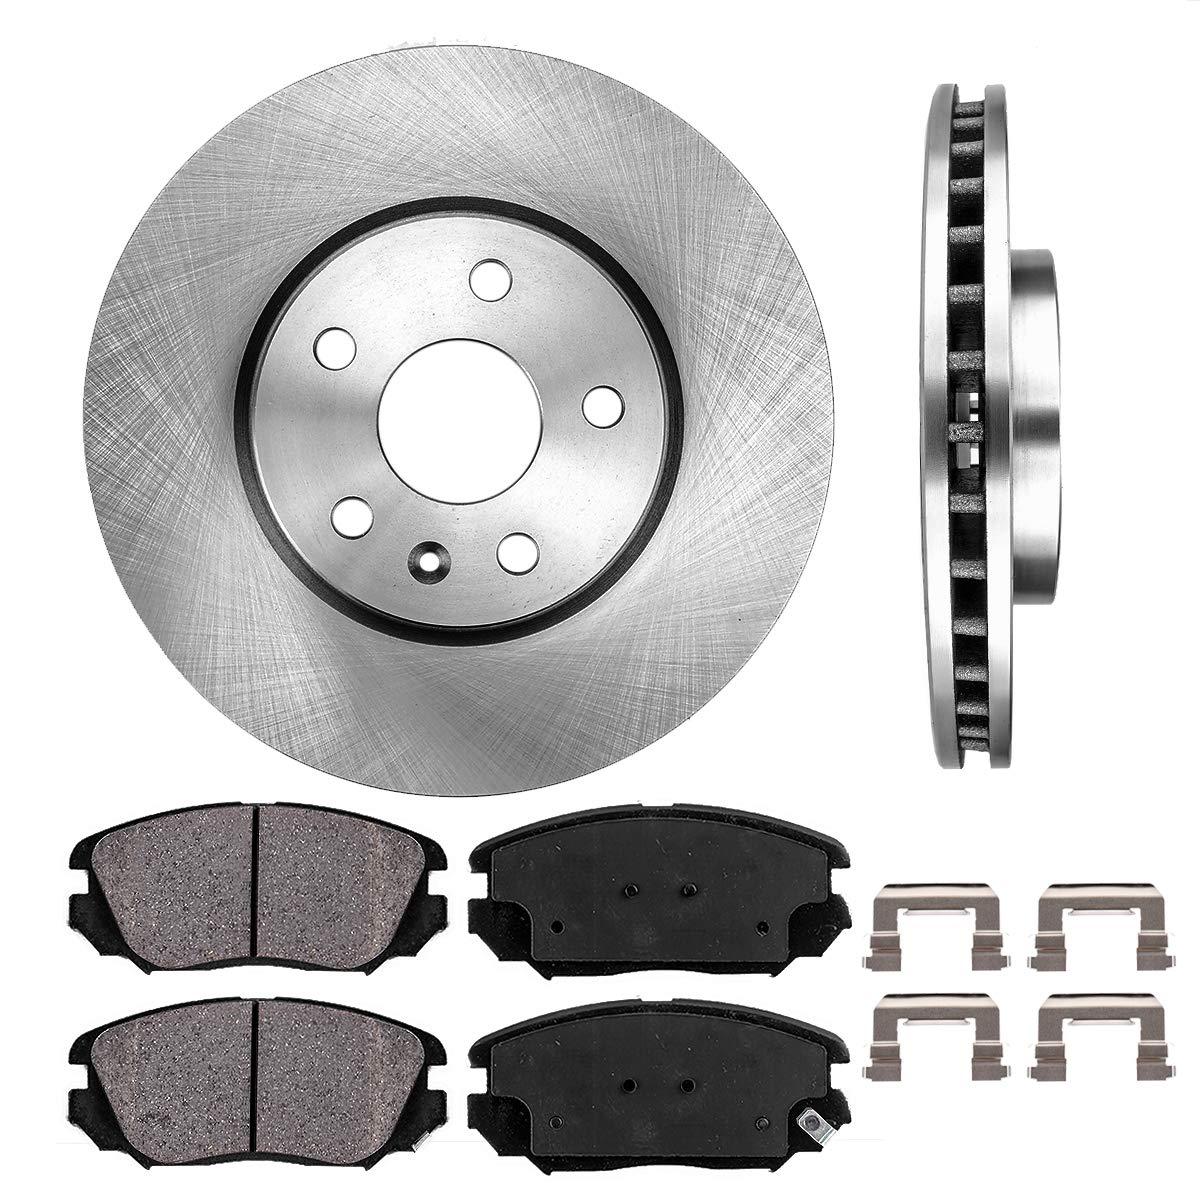 CRK13960 FRONT 321mm Premium OE 5 Lug [2] Brake Rotors + [4] Ceramic Brake Pads + Hardware [ fits Buick Lacrosse Regal | Chevy Equinox Impala Malibu | GMC Terrain | Saab 9-5 ]